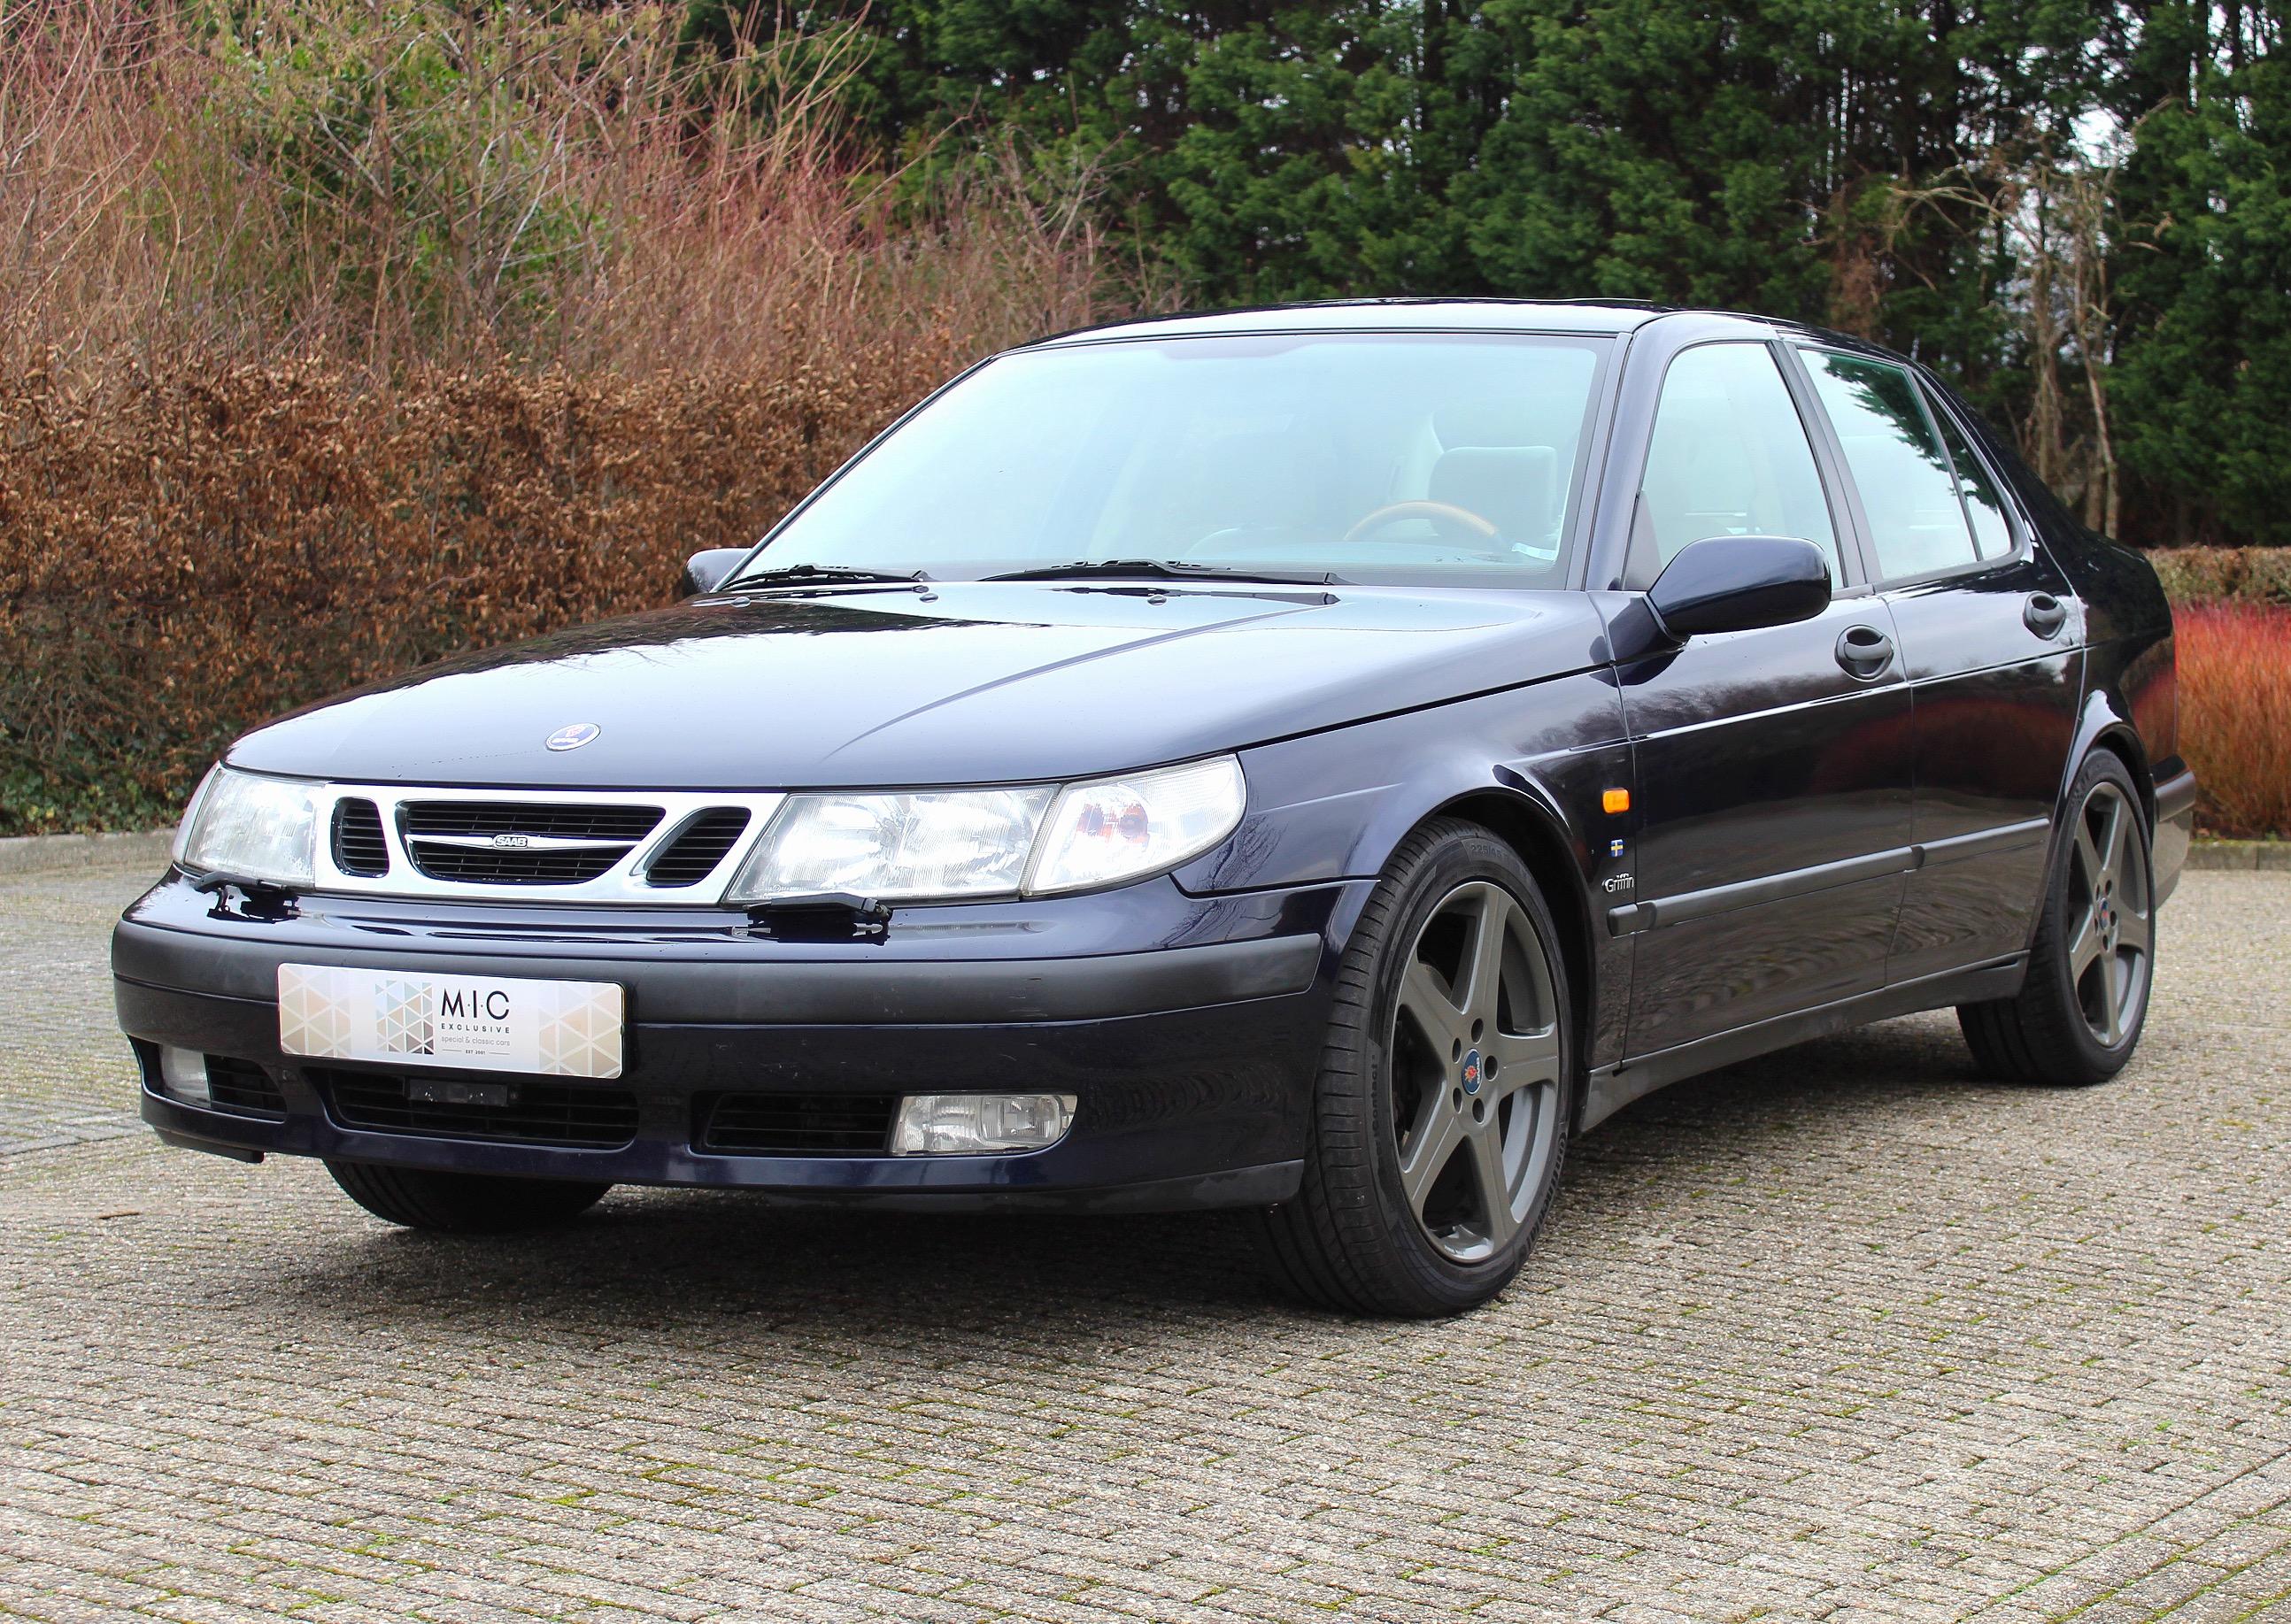 Saab 9-5 3.0 griffin